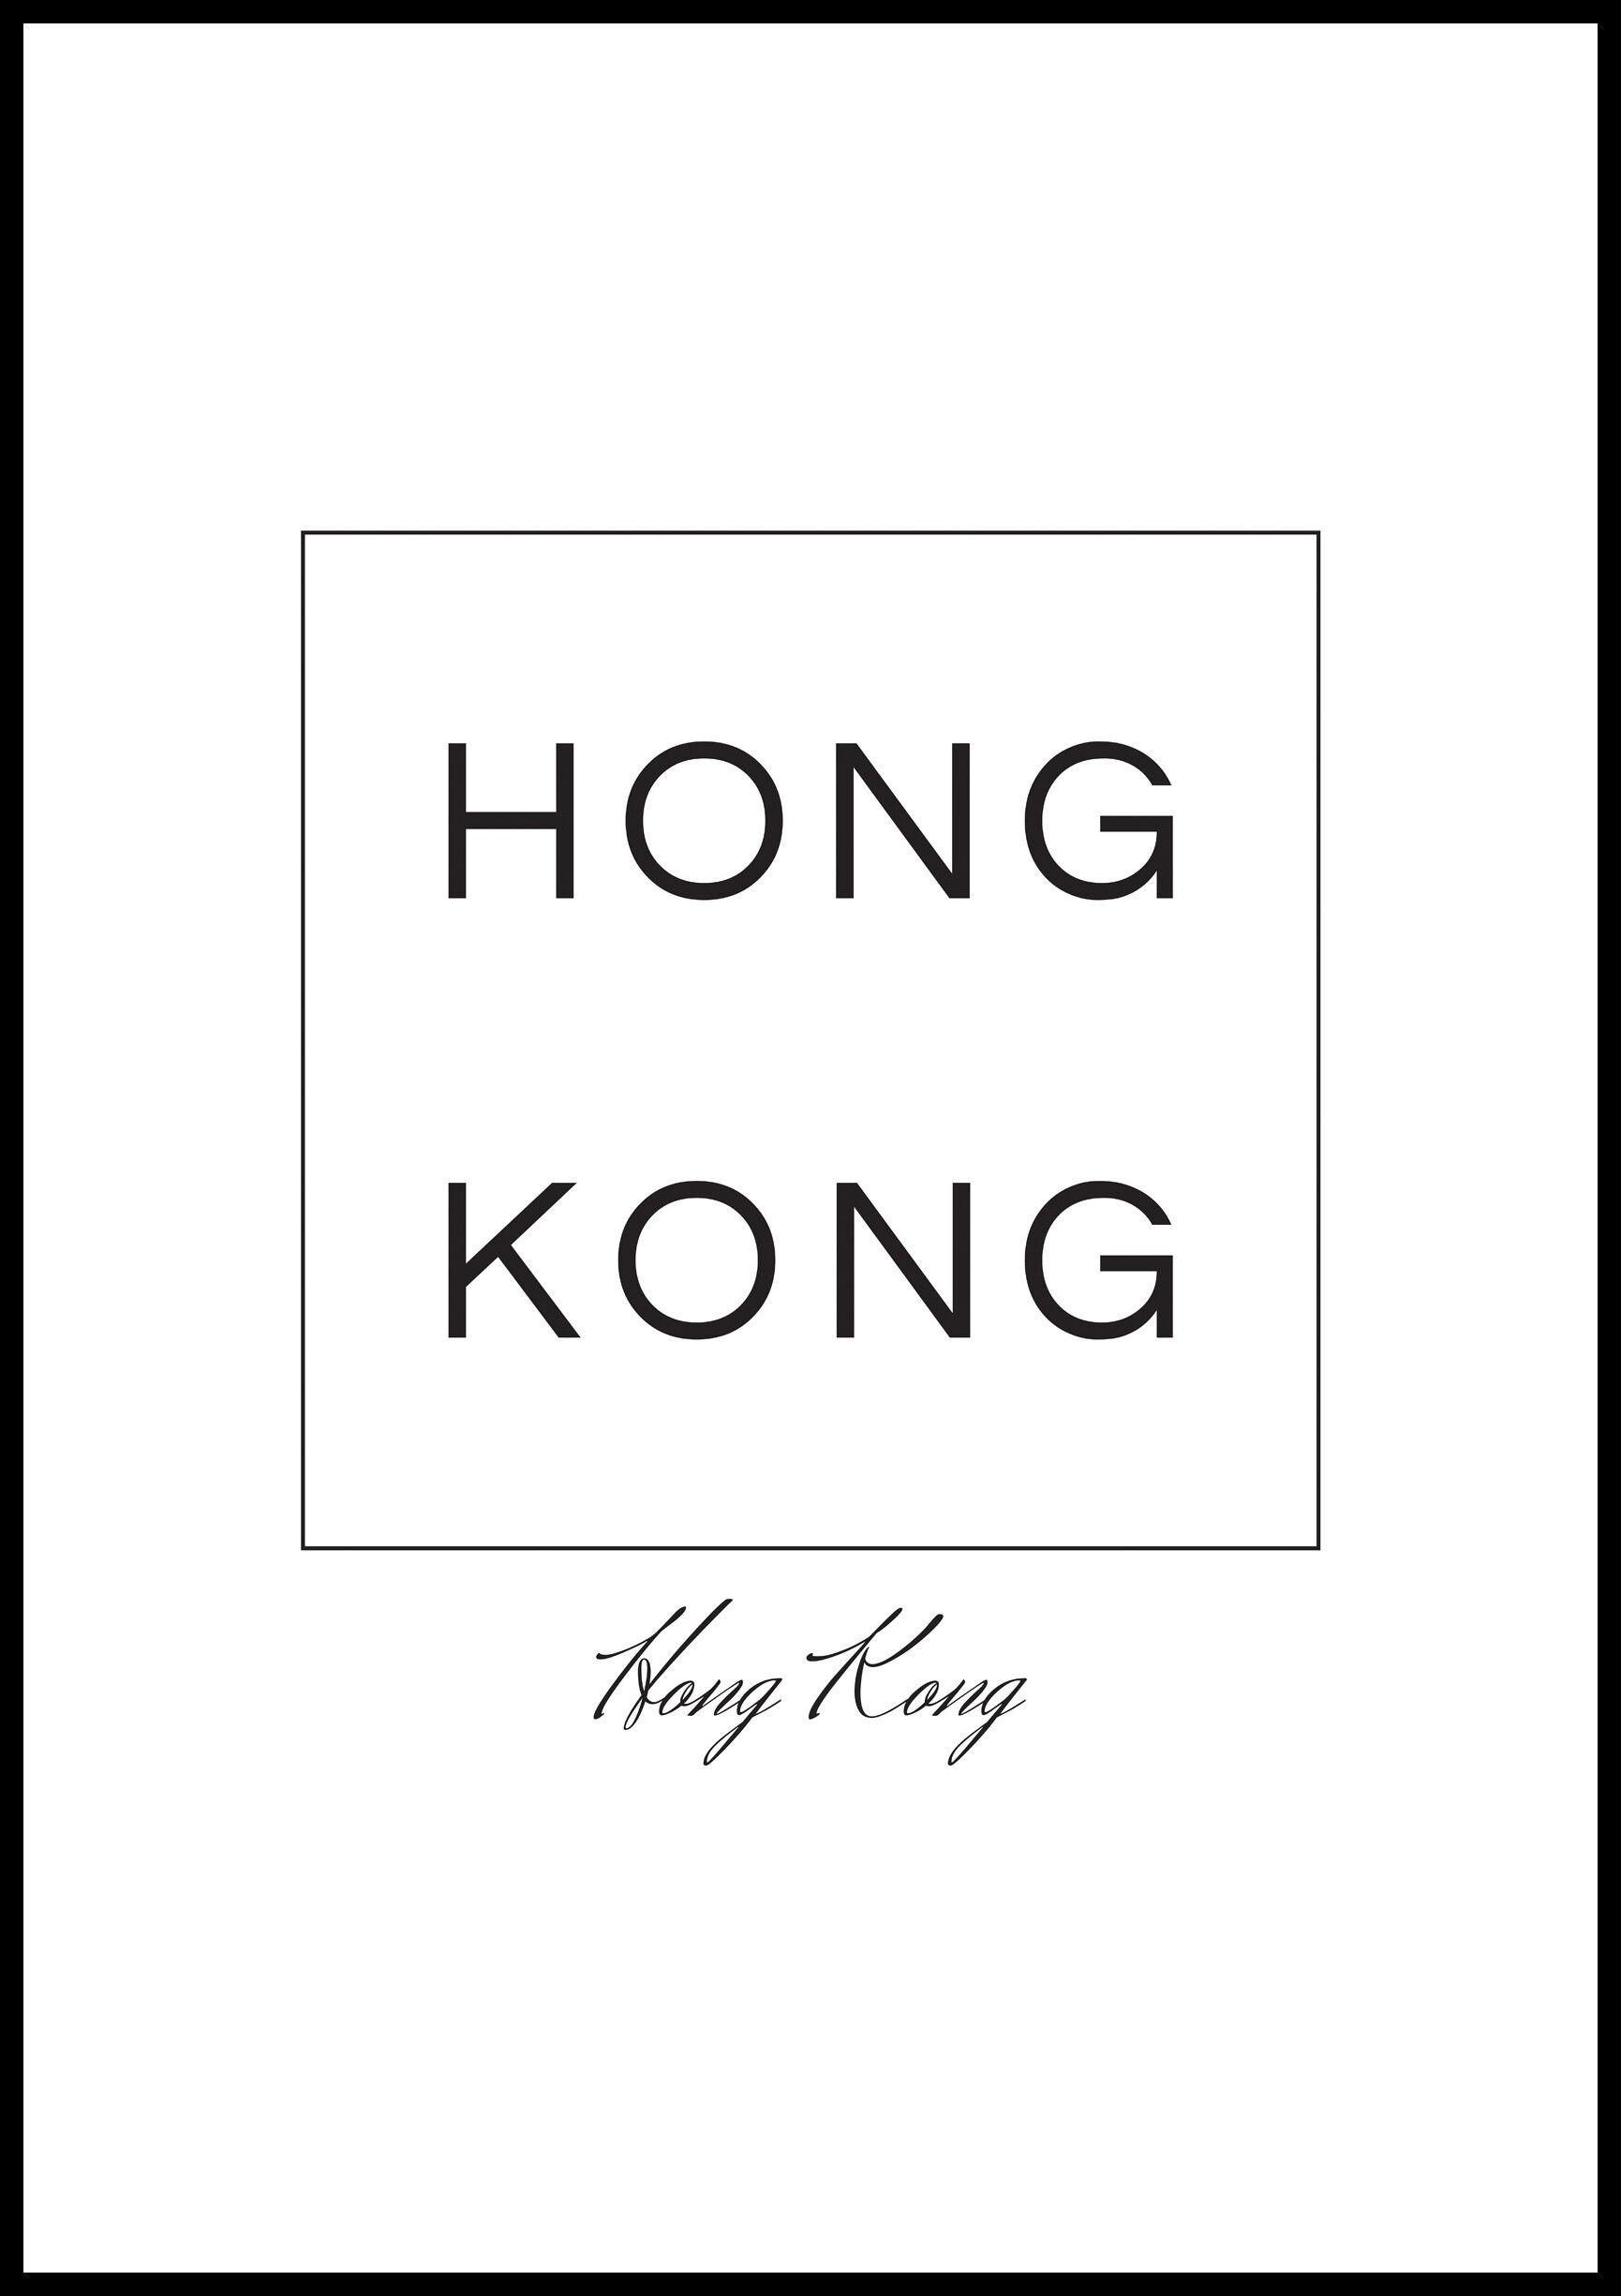 Bildverkstad Hong Kong - Posteri